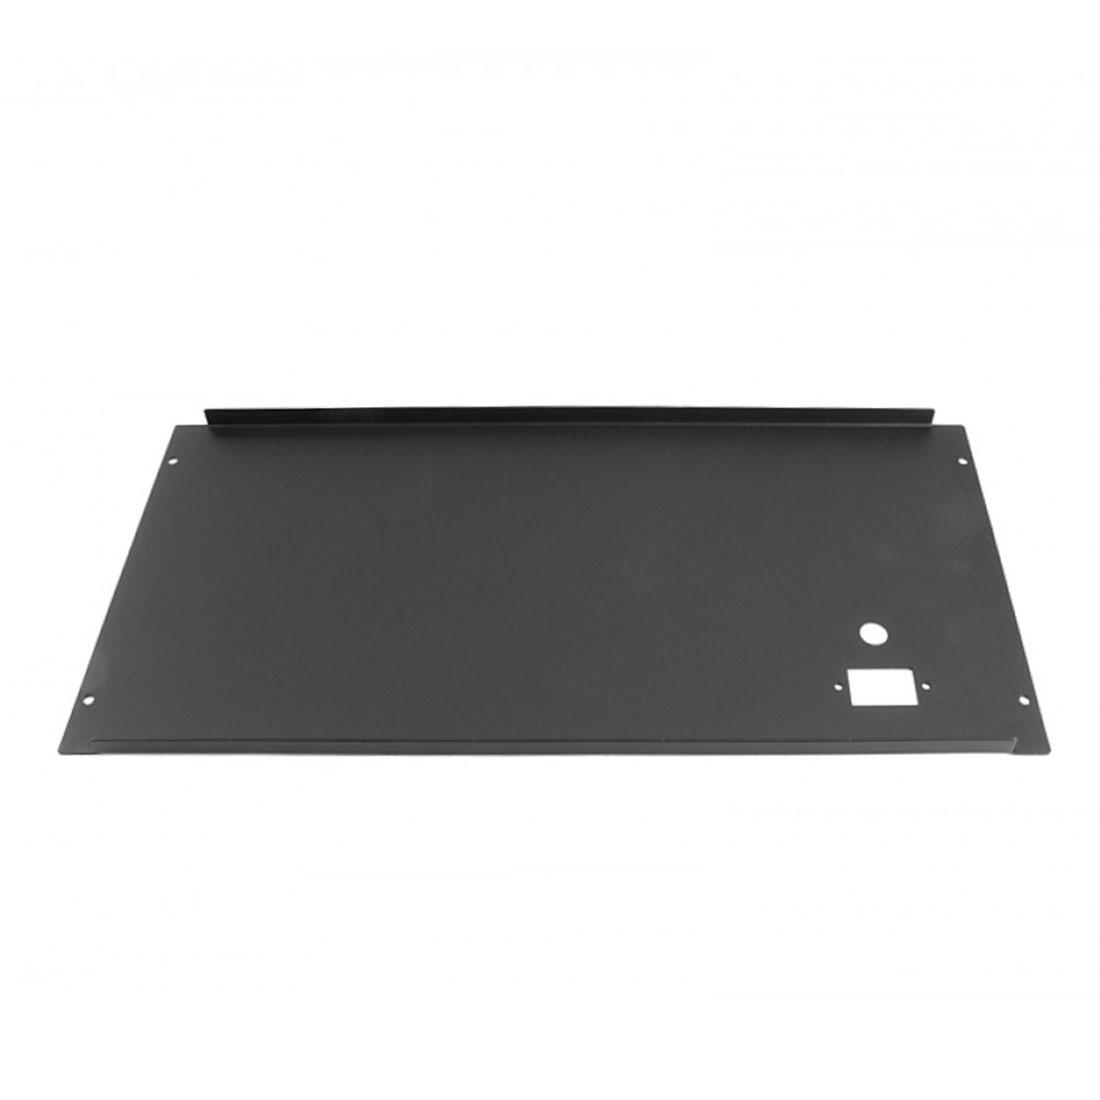 1NPS05PB - 5U rack krabice plechová, 300mm, 10mm - panel stříbrný